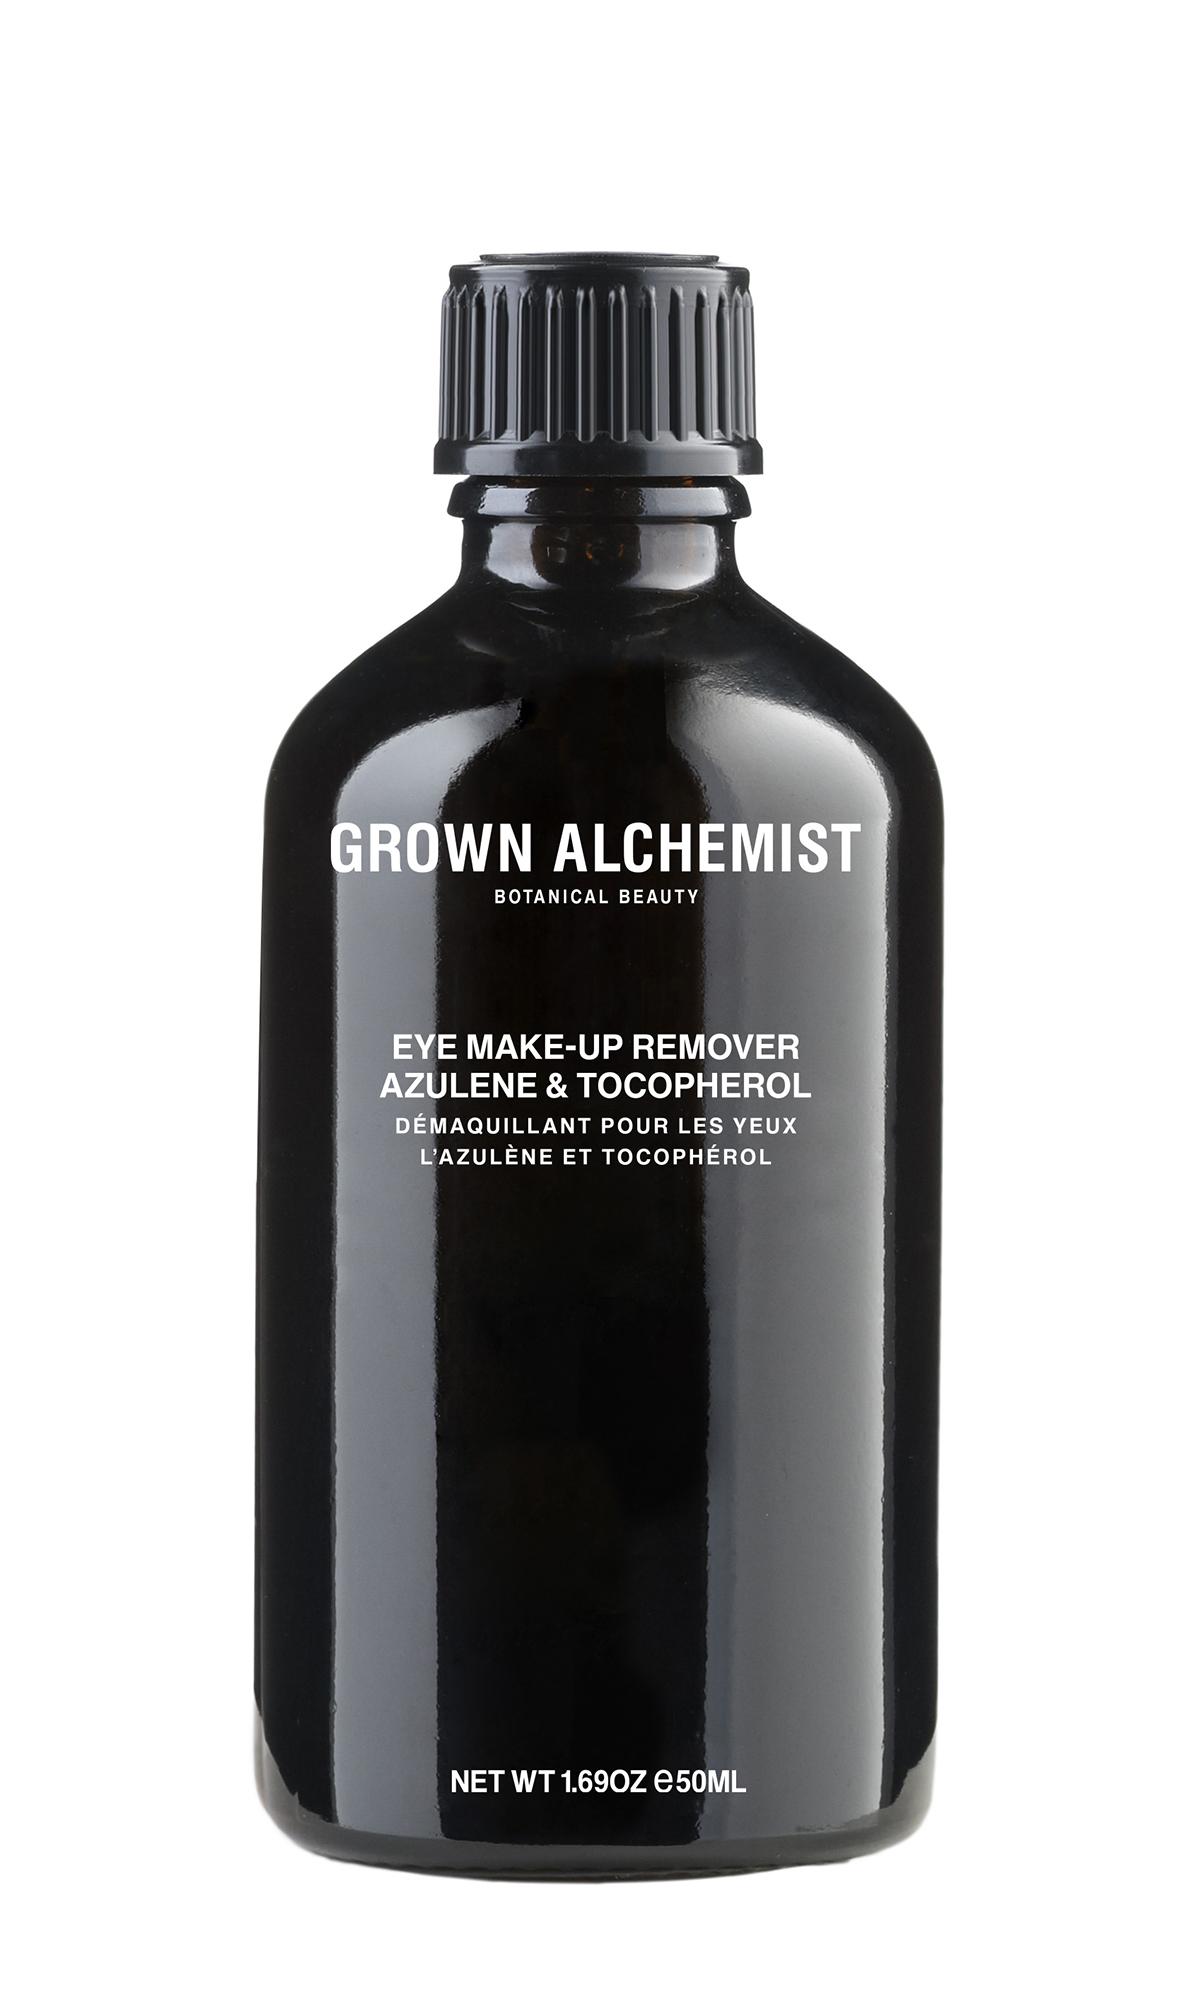 grown alchemist marken puresense naturkosmetik www. Black Bedroom Furniture Sets. Home Design Ideas